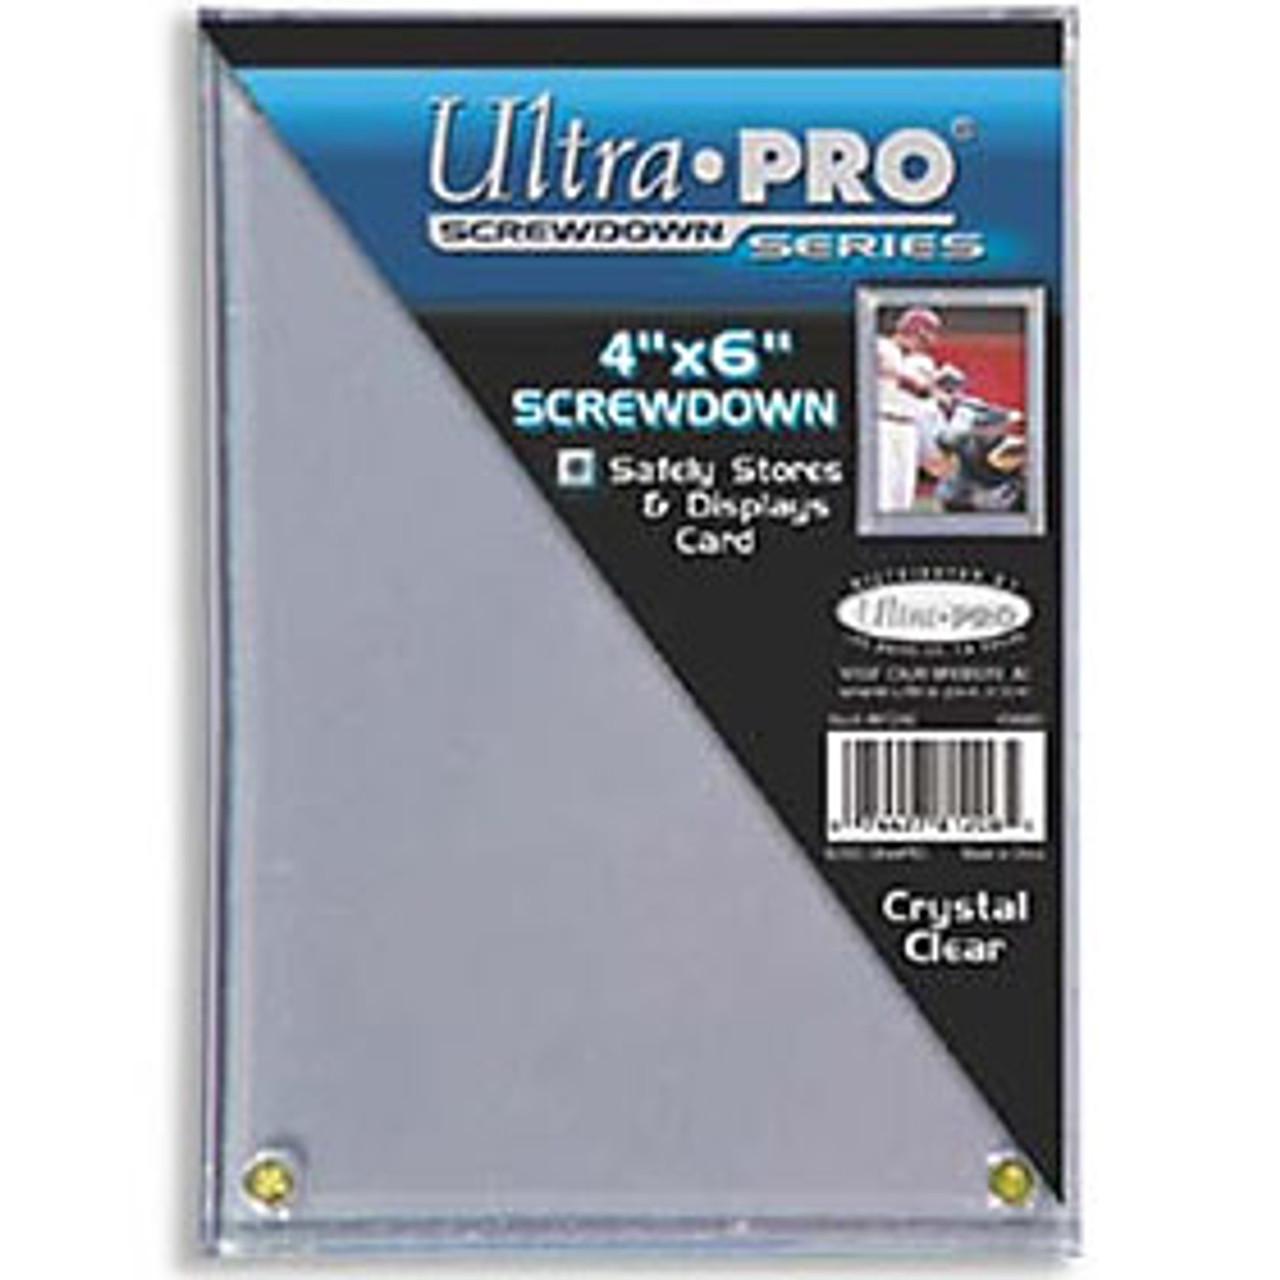 Screwdown - 4